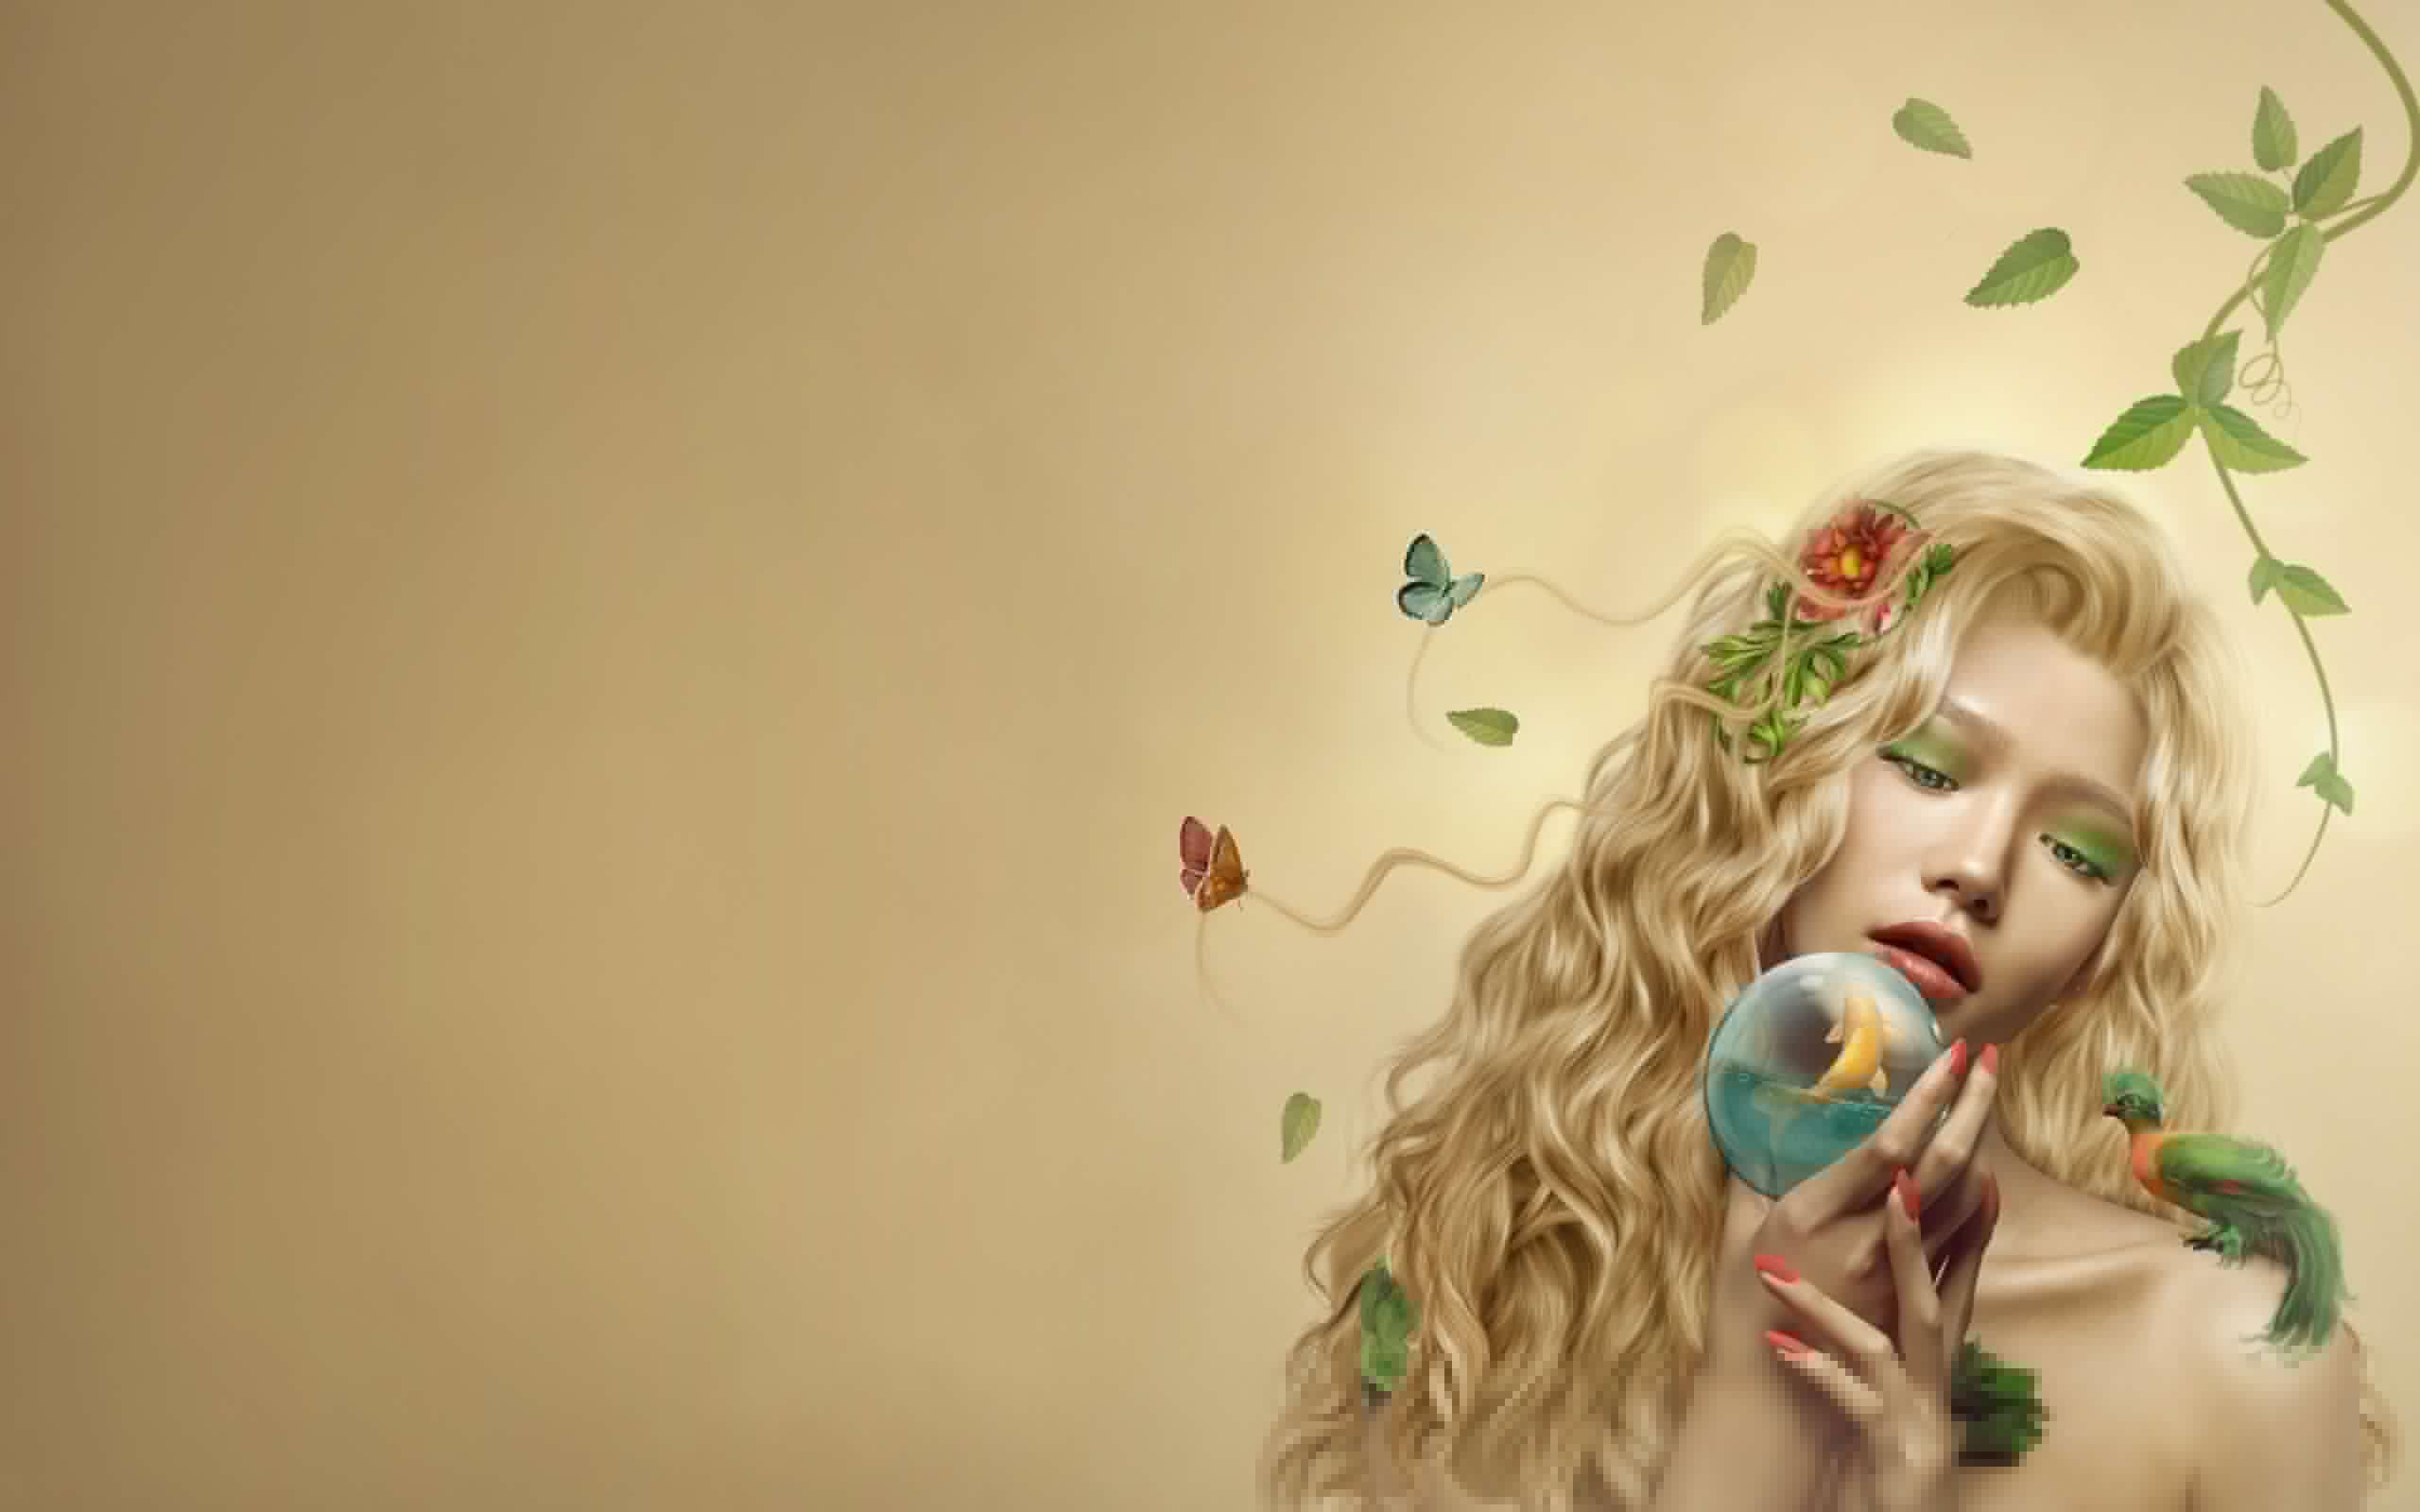 Блондинка корона лепестки  № 2990370 без смс